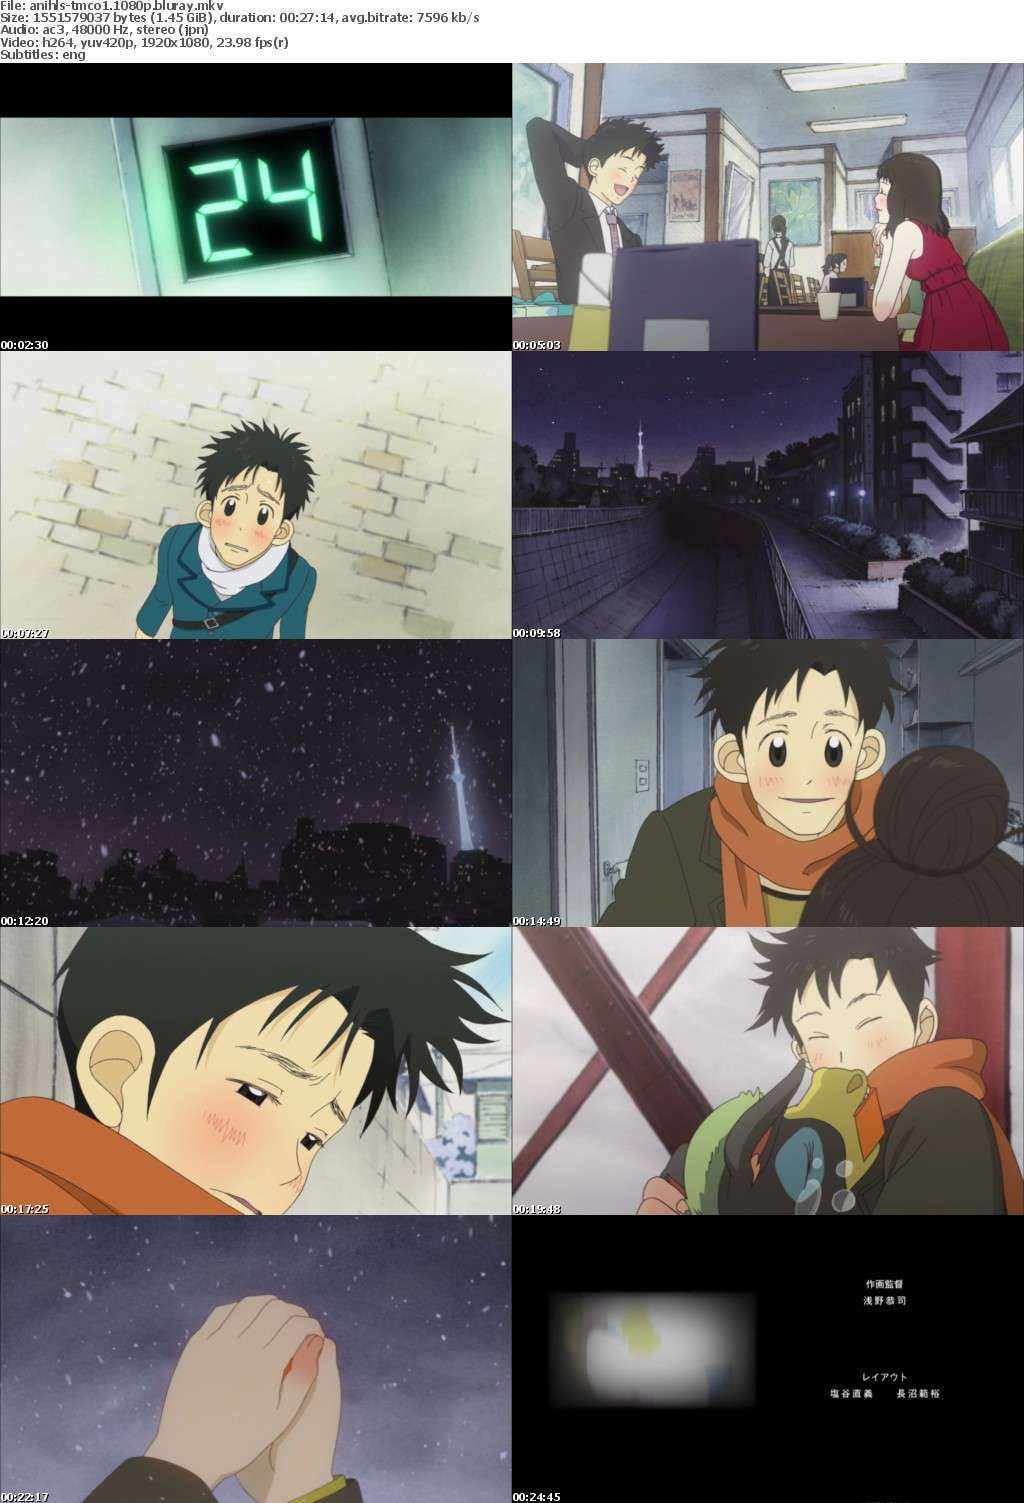 Tokyo Marble Chocolate OVA 01 1080p BluRay x264-ANiHLS